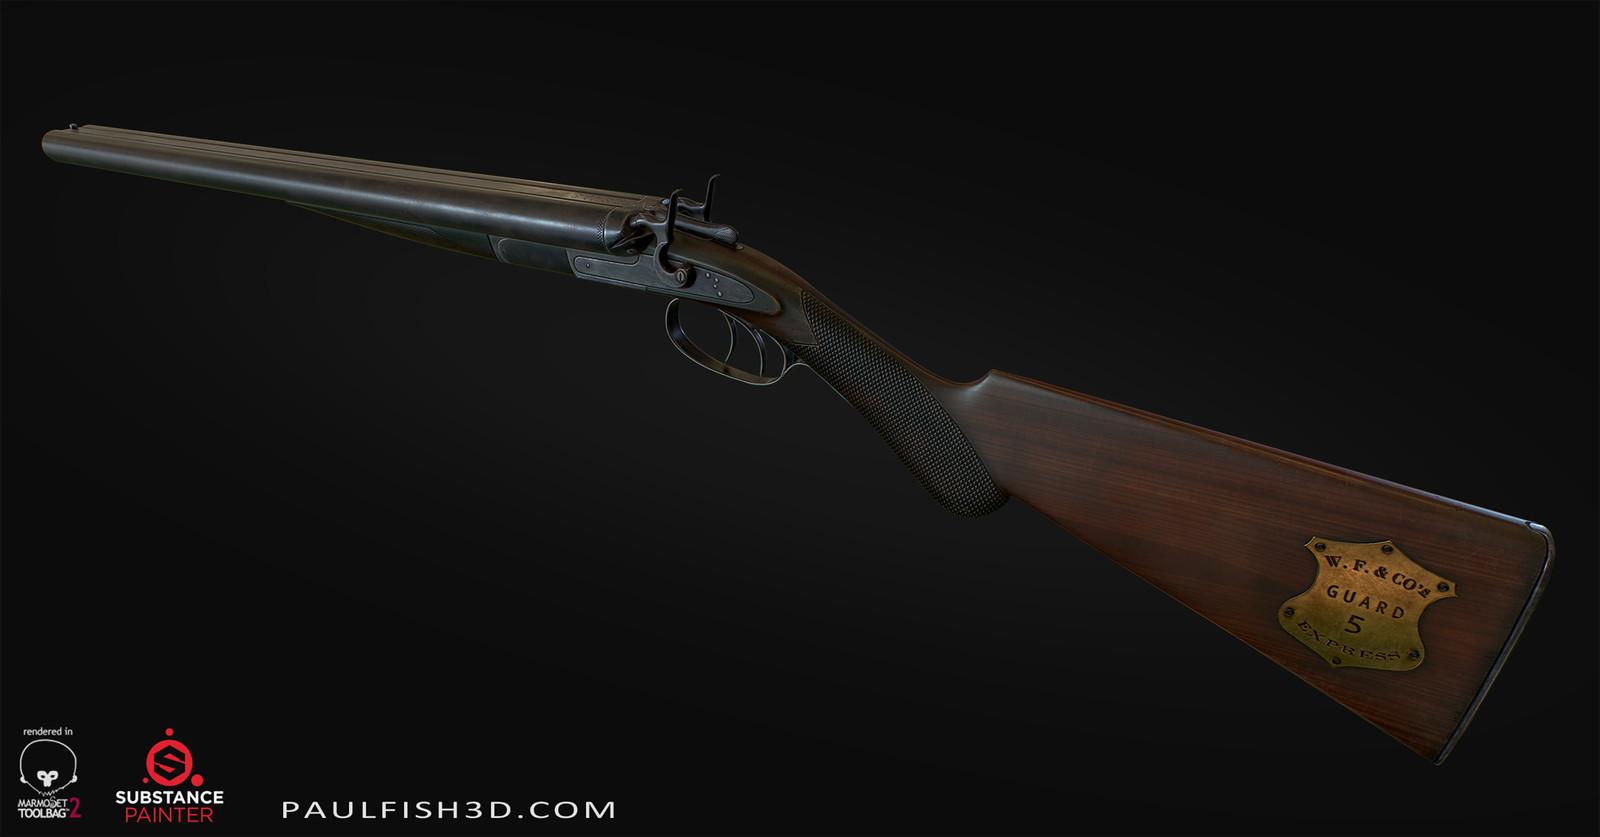 1882 Remington Double Barrel Shotgun